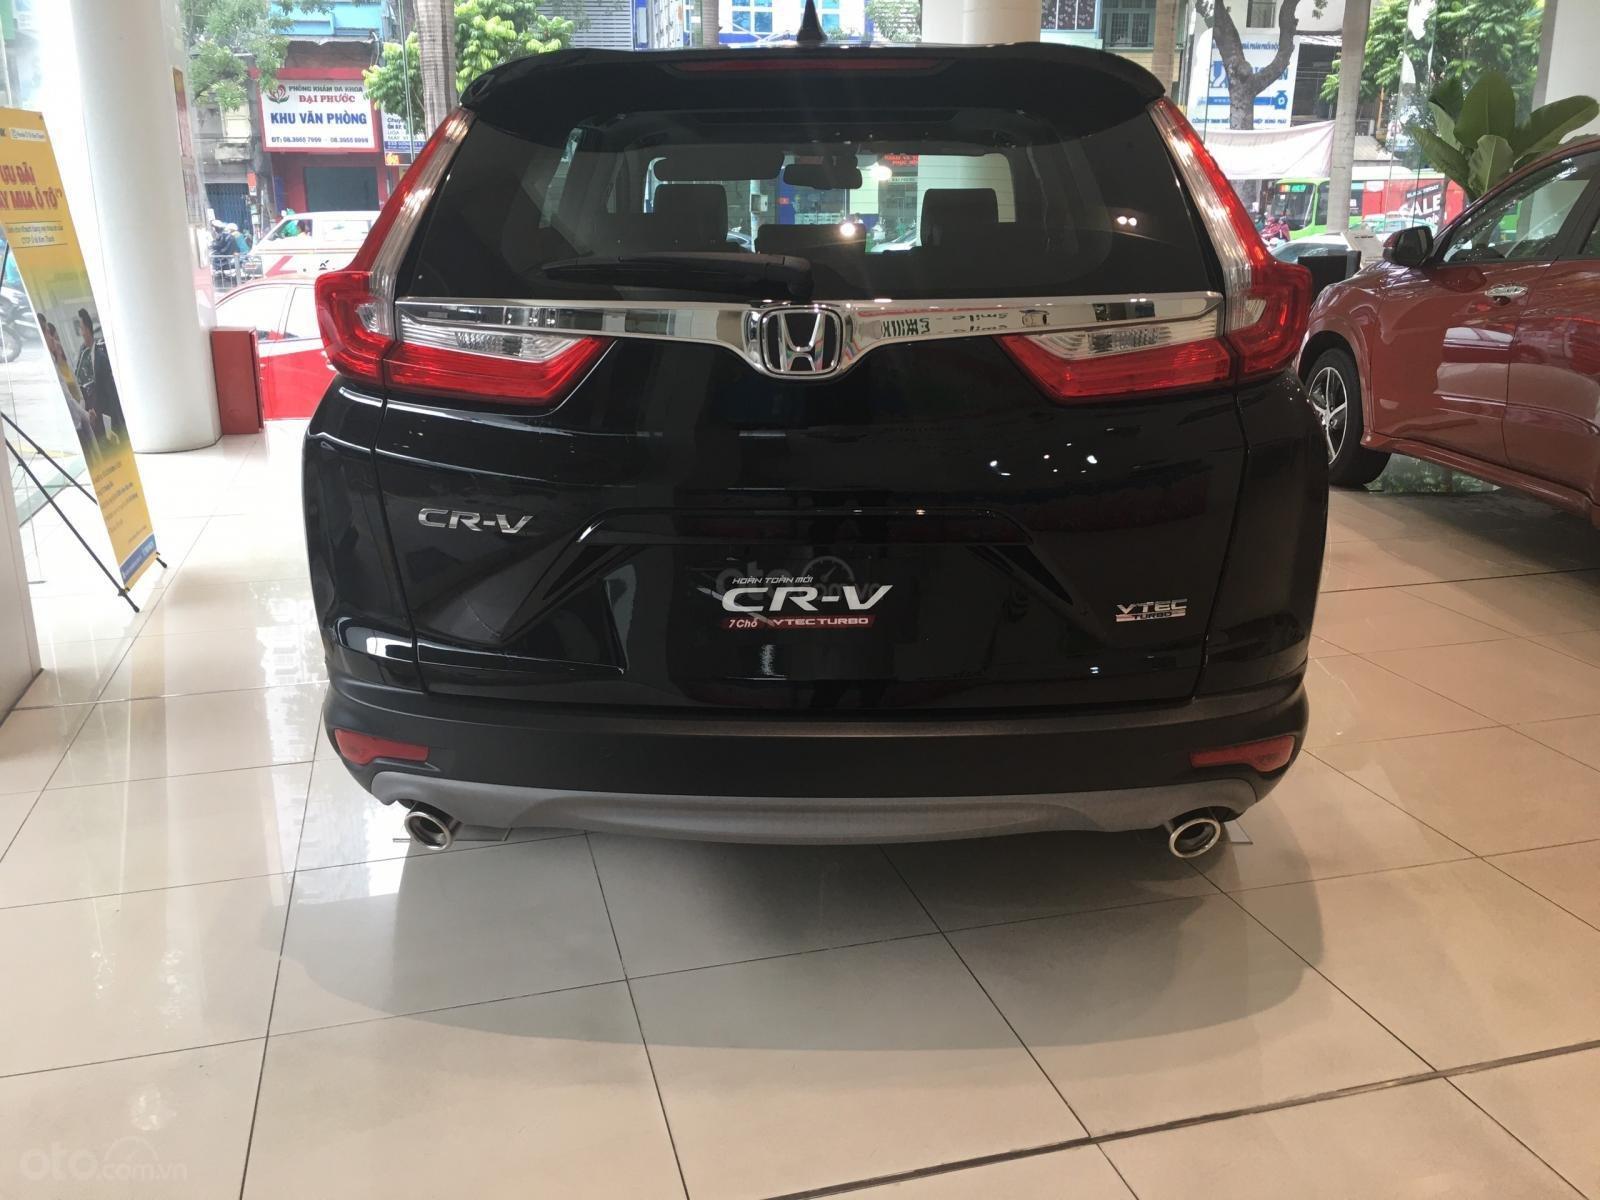 Honda CRV E 2019  + tặng 50 triệu tiền mặt - LH: 0966877768 Mr Hải (5)